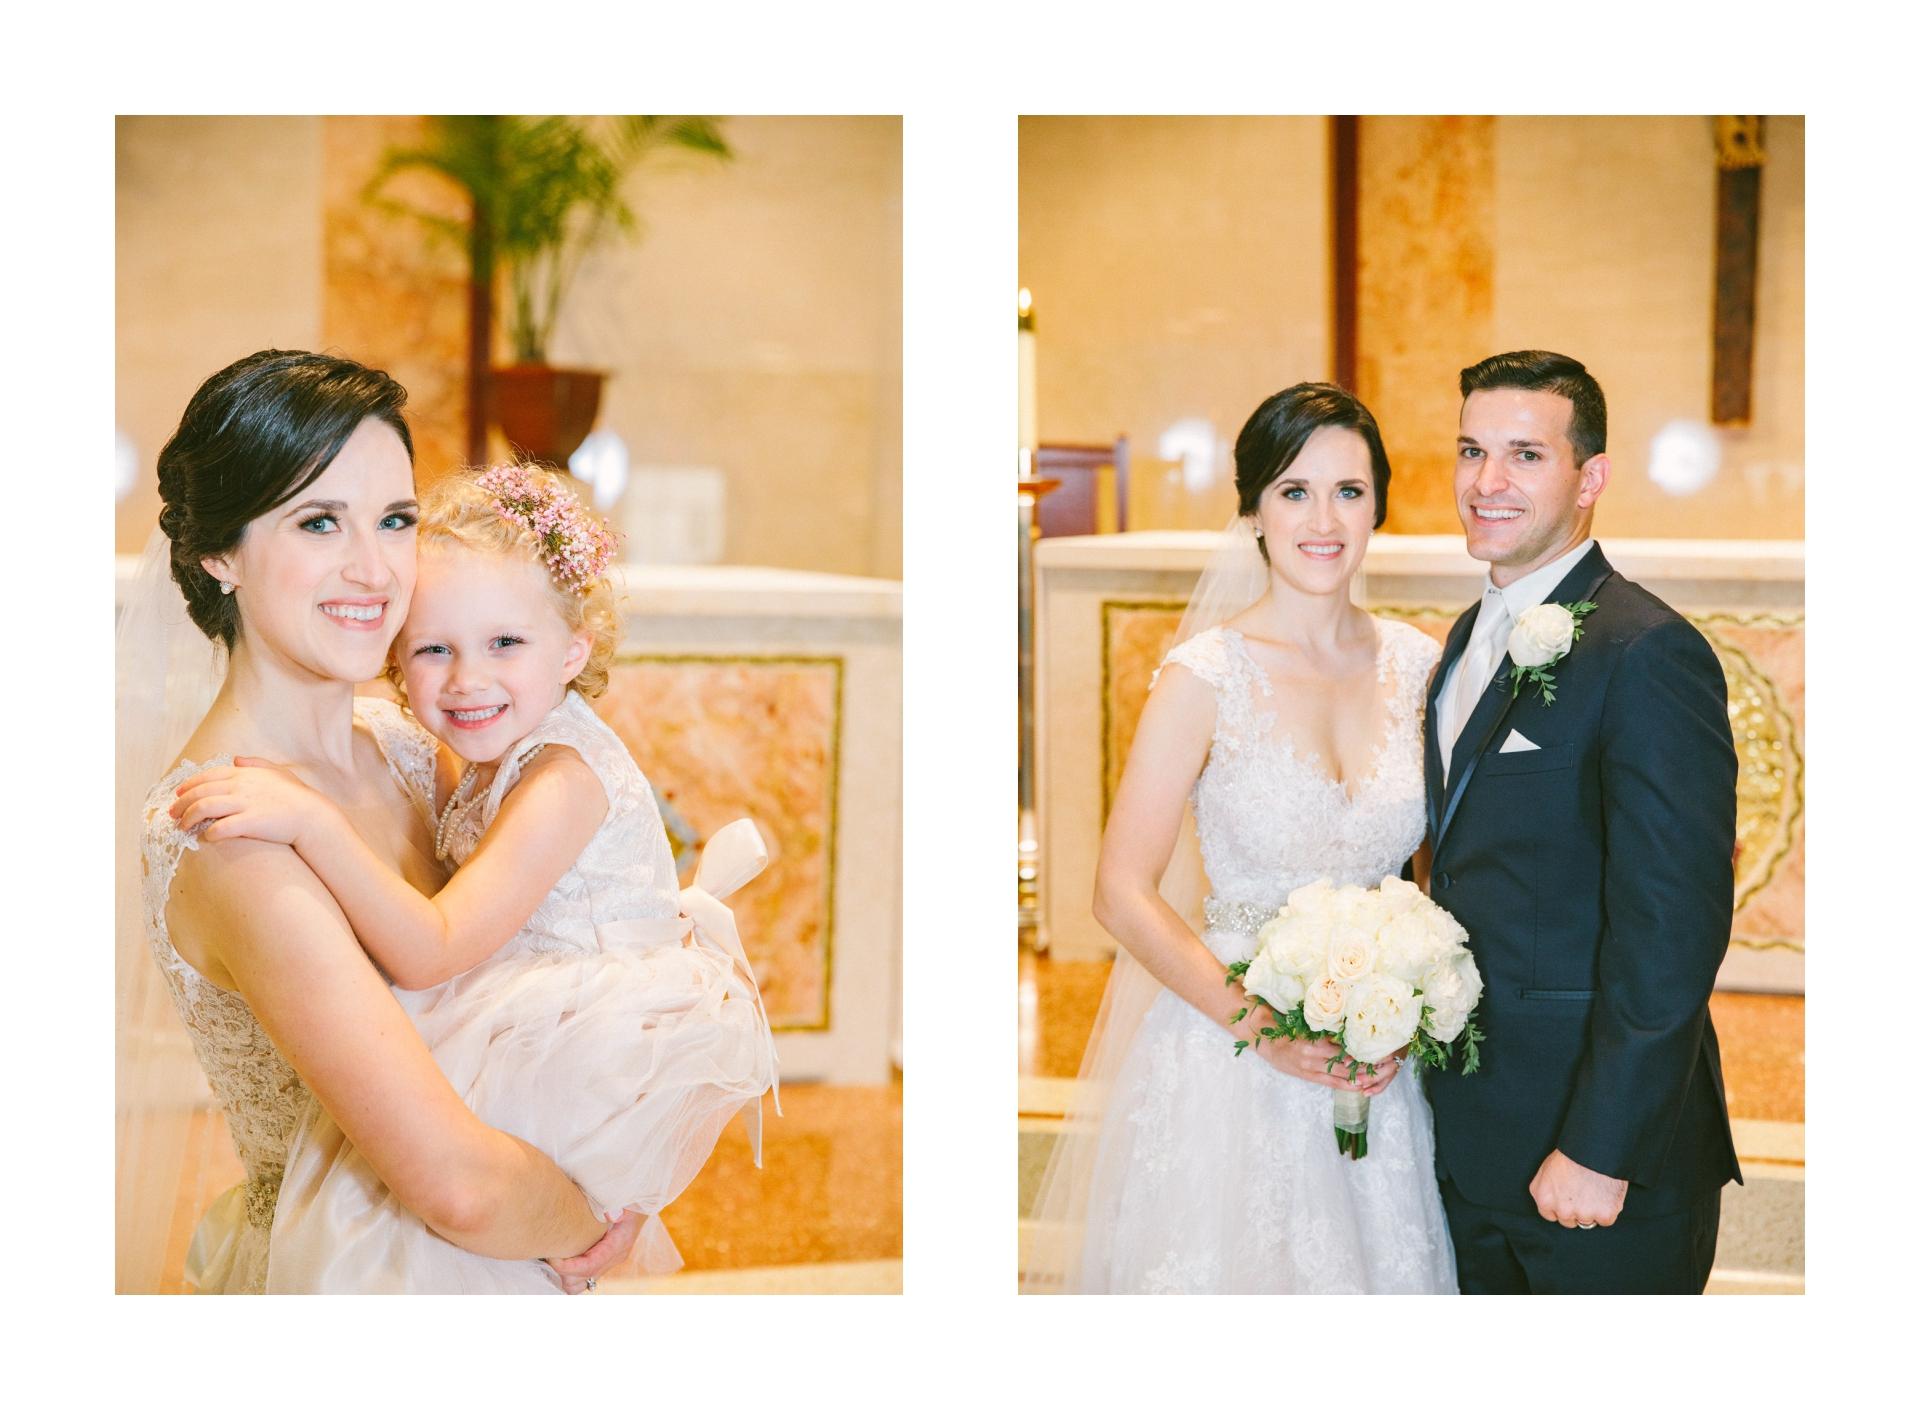 Intercontinental Hotel Wedding in Cleveland 1 41.jpg